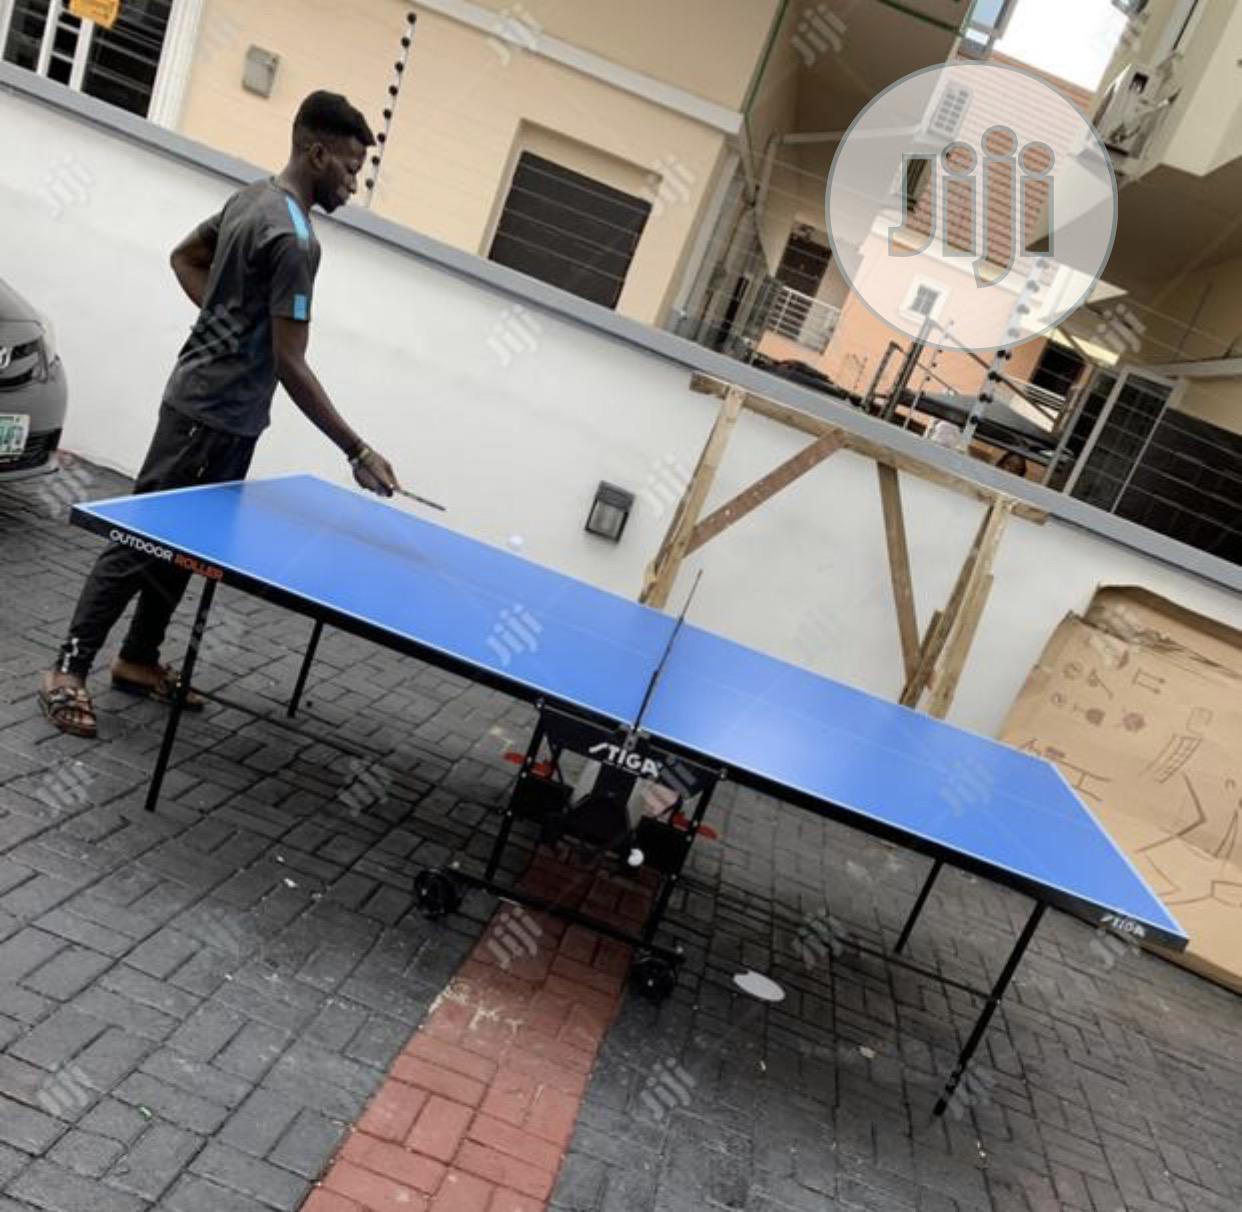 German Table Tennis Board ( Stiga)